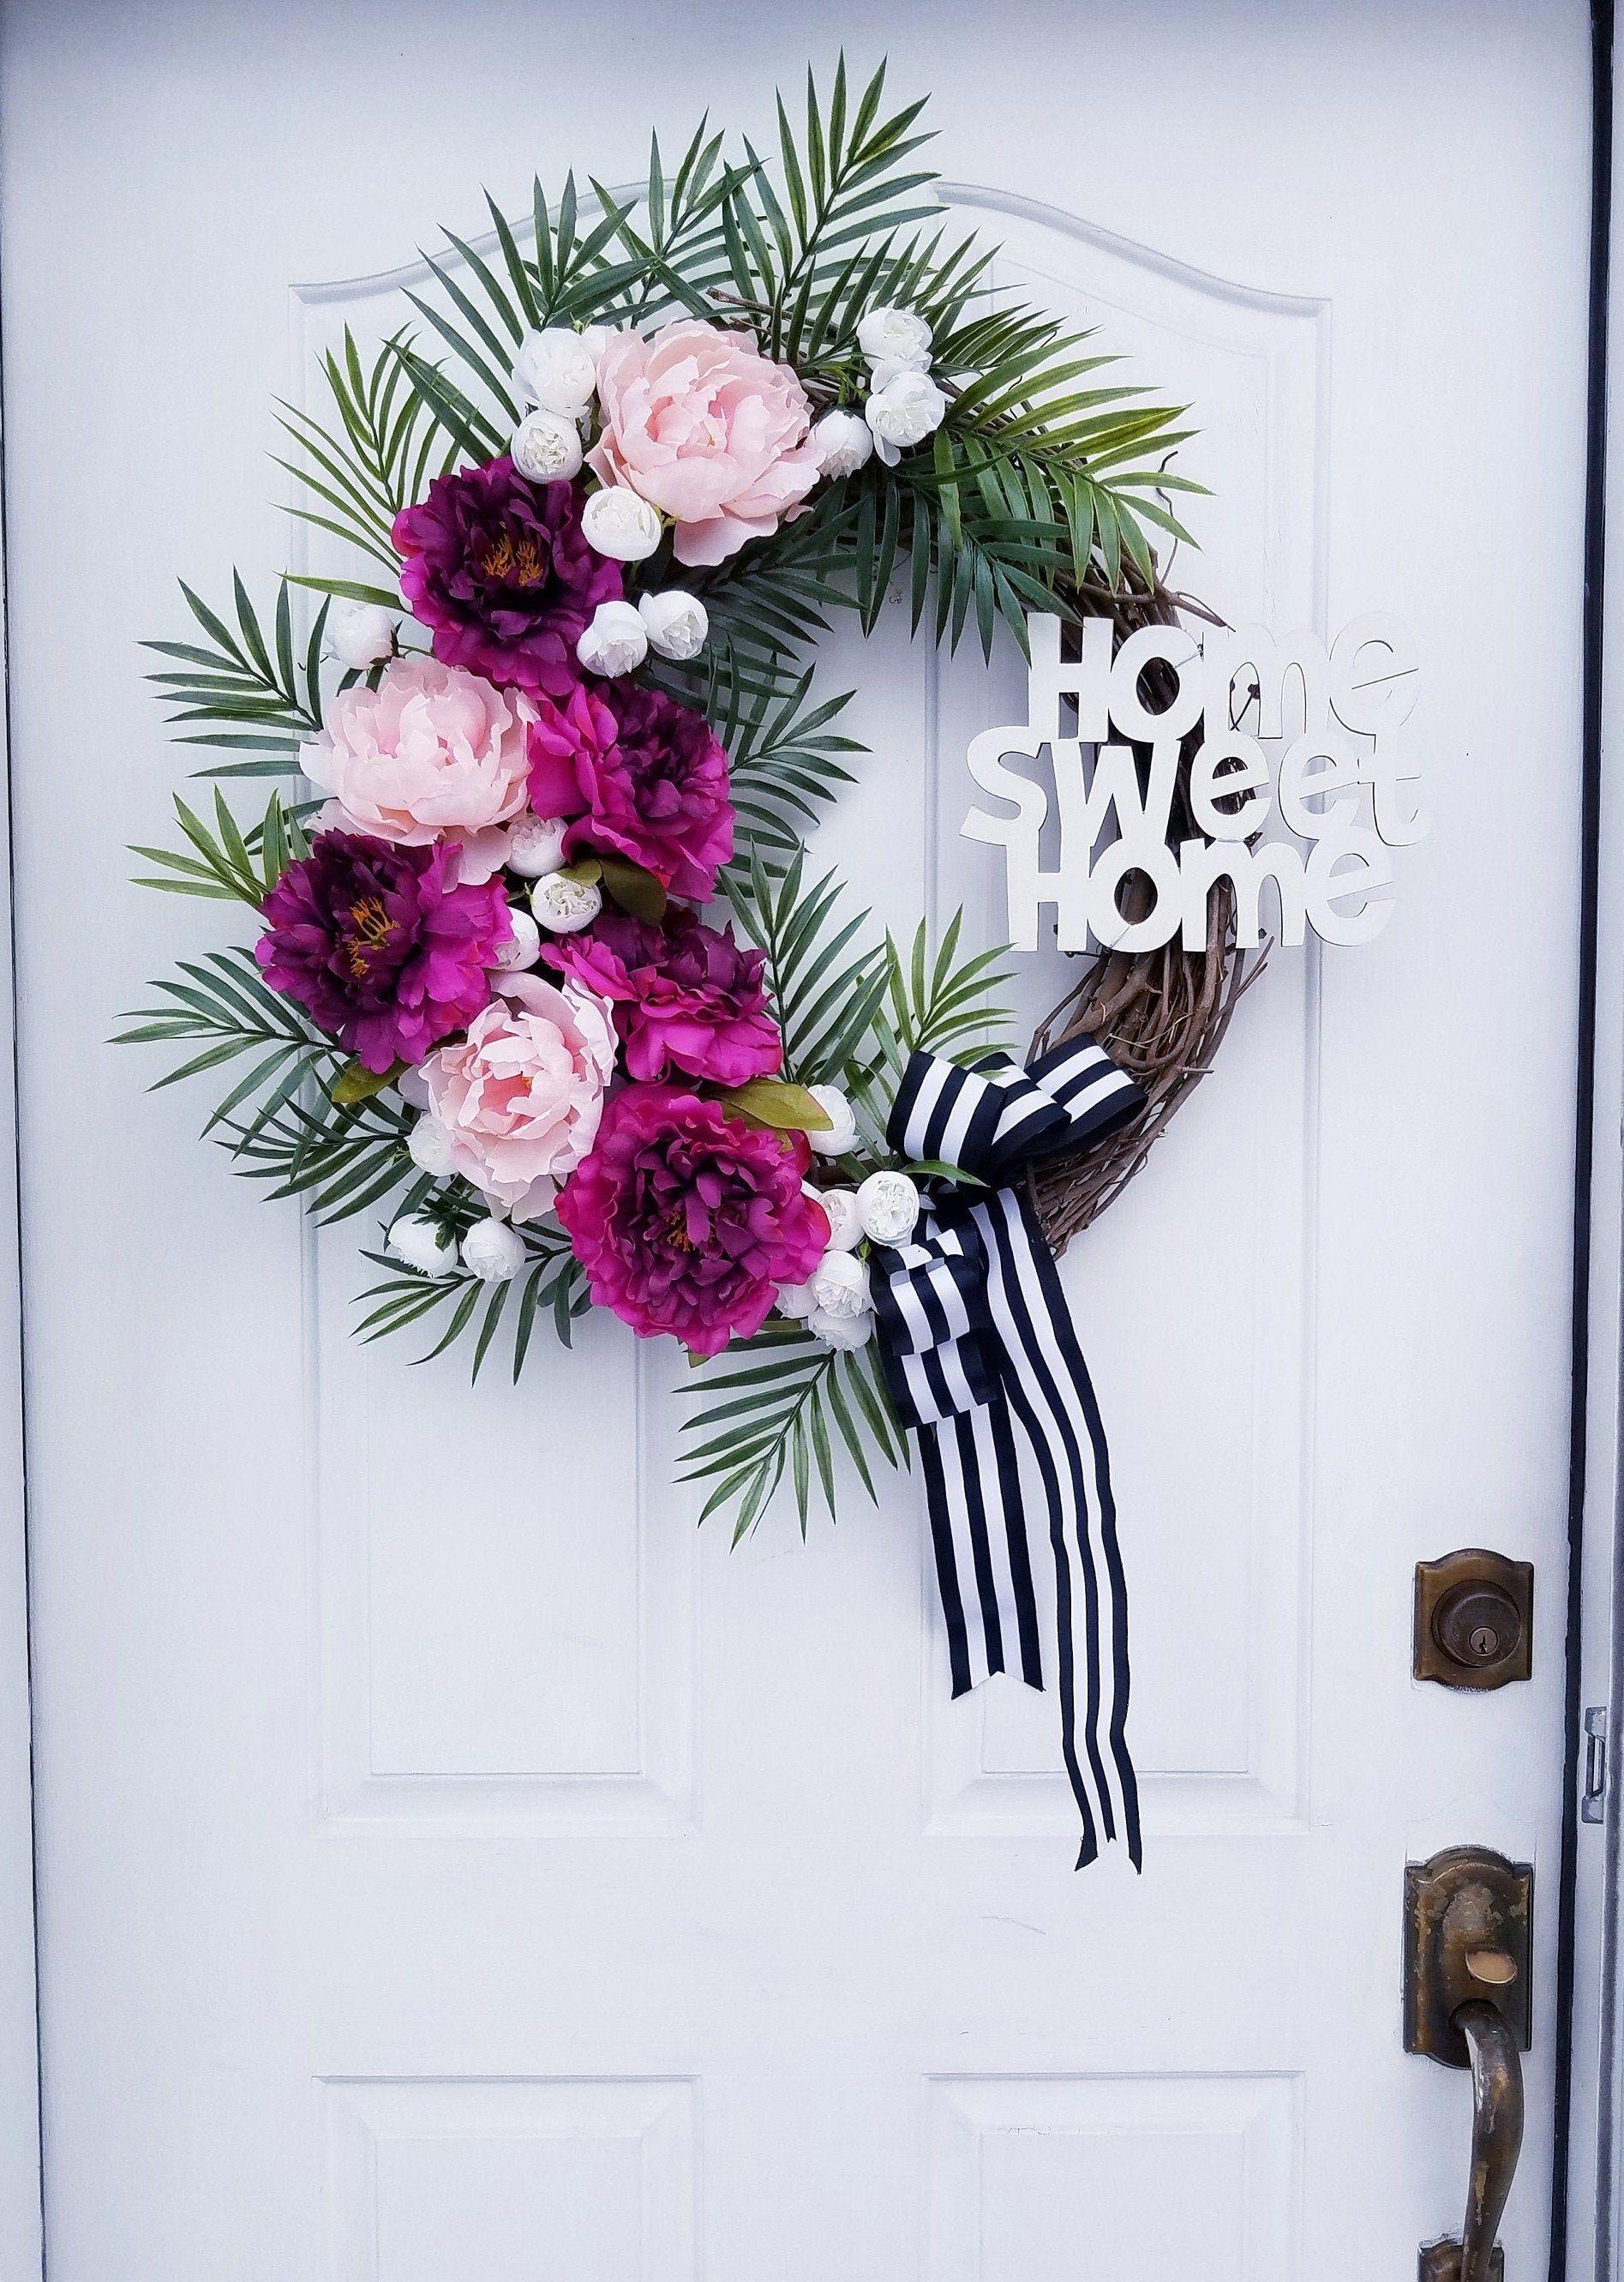 Summer Wreath, Pink Peonies Wreath, Home Sweet Home, Floral Home Decor  #SummerWreath #SpringWreath #FrontDoorDecor #PinkPeonyWreath #FarmhouseWreath #HandmadeForHome #HomeSweetHome #FloralWreath #FloralHomeDecor #FrontDoorWreath